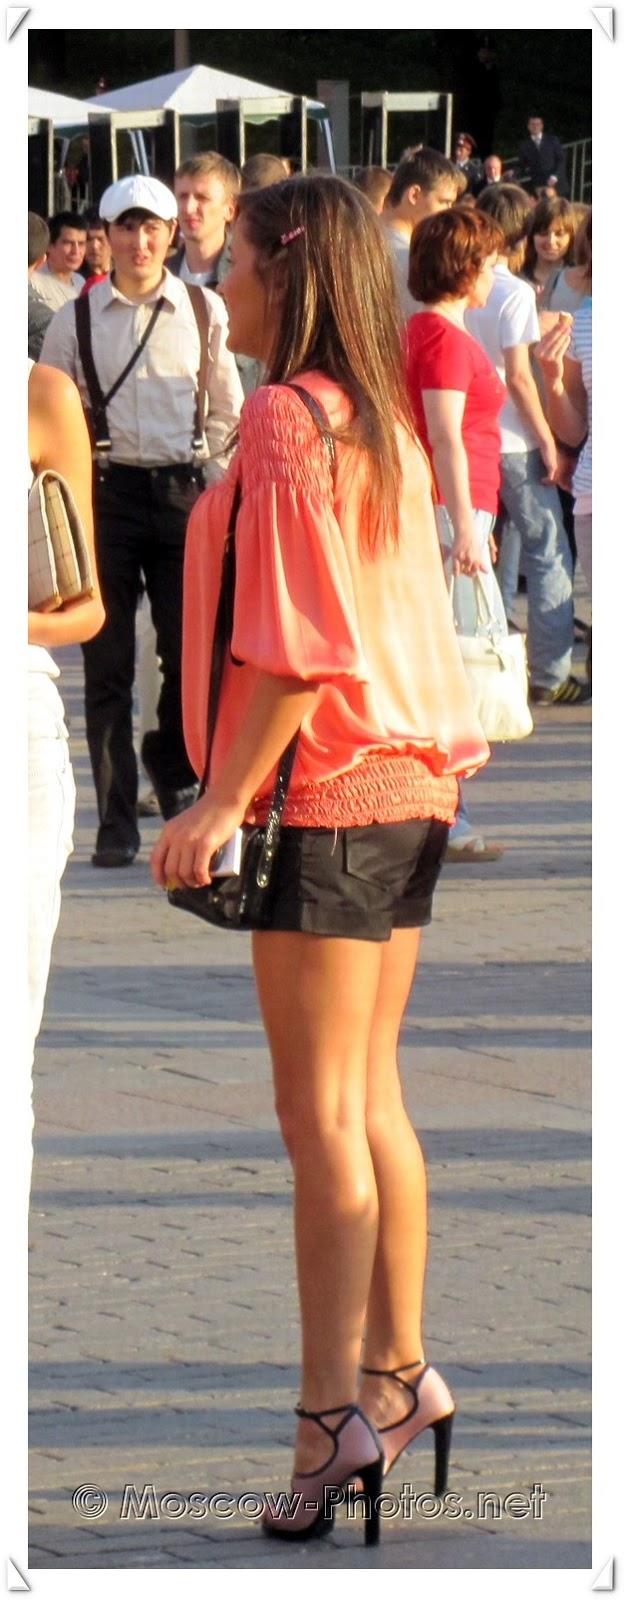 Cool Moscow girl on stilettos